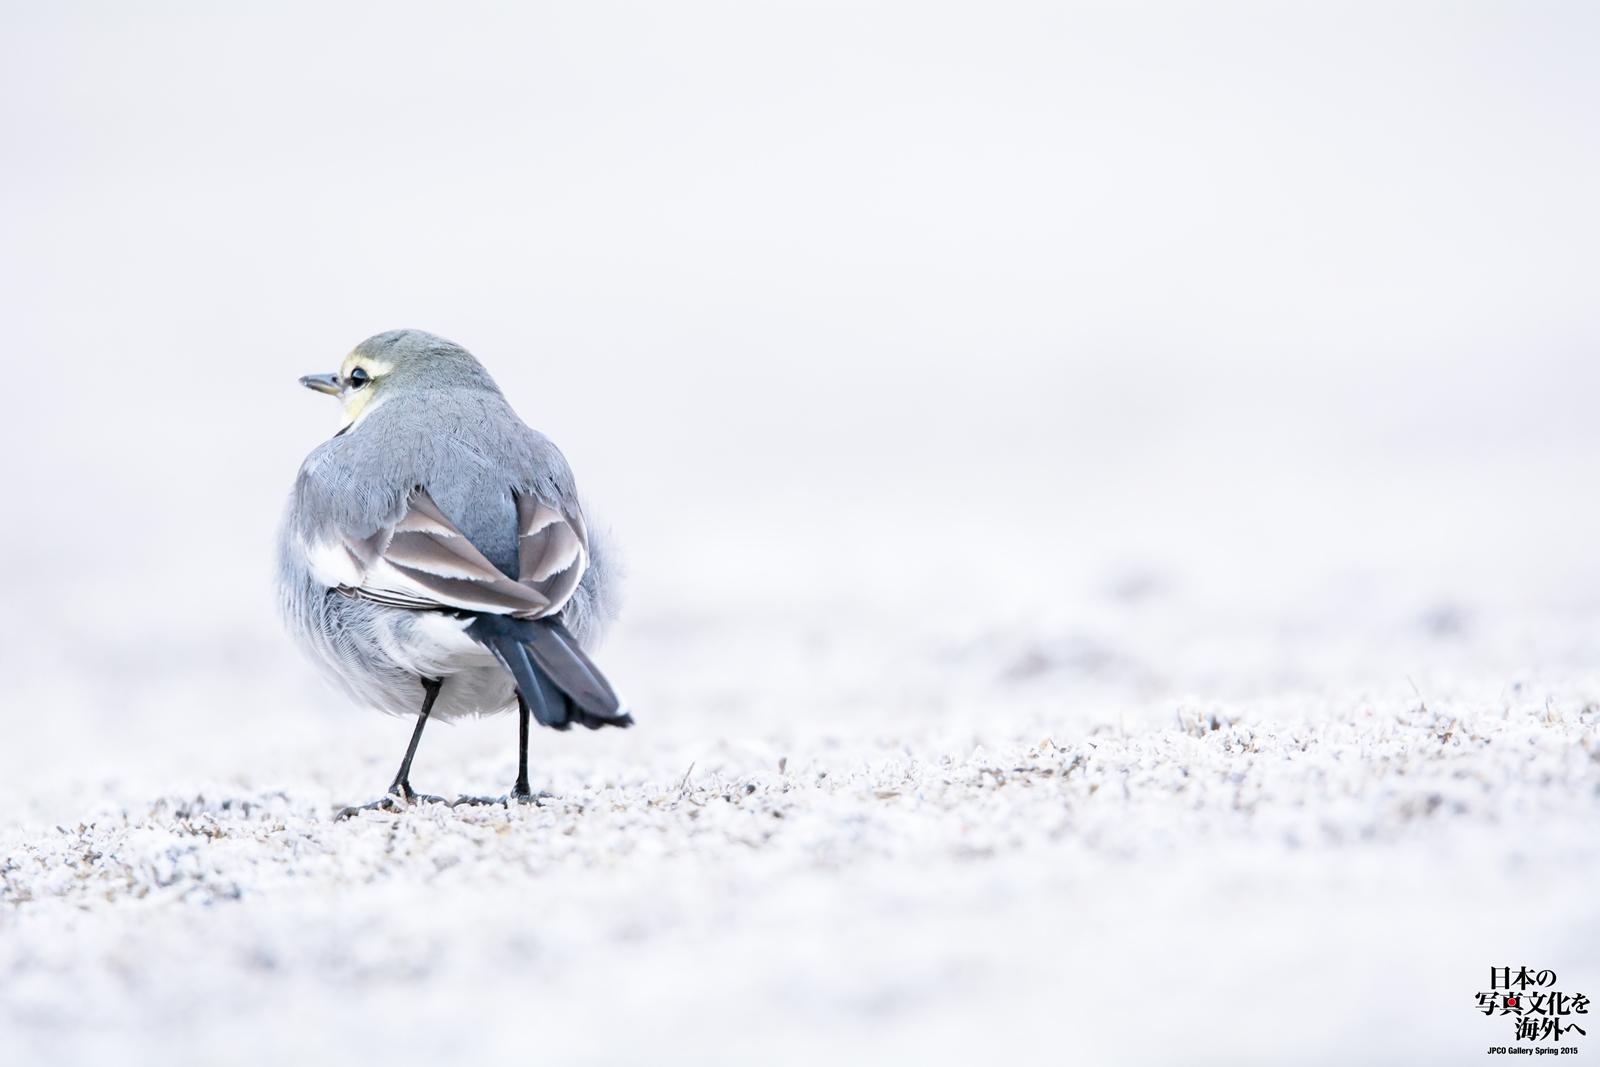 Photo: 白い季節 White season  色の無い季節 でも僕がいる そして君がいる 存在を色濃く感じる季節  White Wagtail. (ハクセキレイ)  #cooljapan #365cooljapanmay #birdphotography #birds #sigma #kawaii #JPCOGallerySpring2015 #日本の写真文化を海外へ  Nikon D7100 SIGMA 150-600mm F5-6.3 DG OS HSM Sports  [ Day282, February 18th ]  ★こちらの一枚は、 グループ写真展 『JPCO Gallery Spring 2015 / 日本の写真文化を海外へ』 の出展作品となります。  色のない季節だからこそ感じられる 存在と言う色濃さを ゆっくりと時間をかけて 言葉と合わせて感じていただけたら幸いです。  ・私の在廊予定日 21(土) : 15:00~19:00 22(日) : 13:00~16:00 (土日はトークイベントも開催され 自分も土曜日にトークさせていただきます。)  < http://islandgallery.jp/10839 >  小鳥の詩朗読 http://youtu.be/KQkaOGnZ8NY?list=PL2YtHGm0-R3qVsaqvQe9OYdJFCkI98wzF